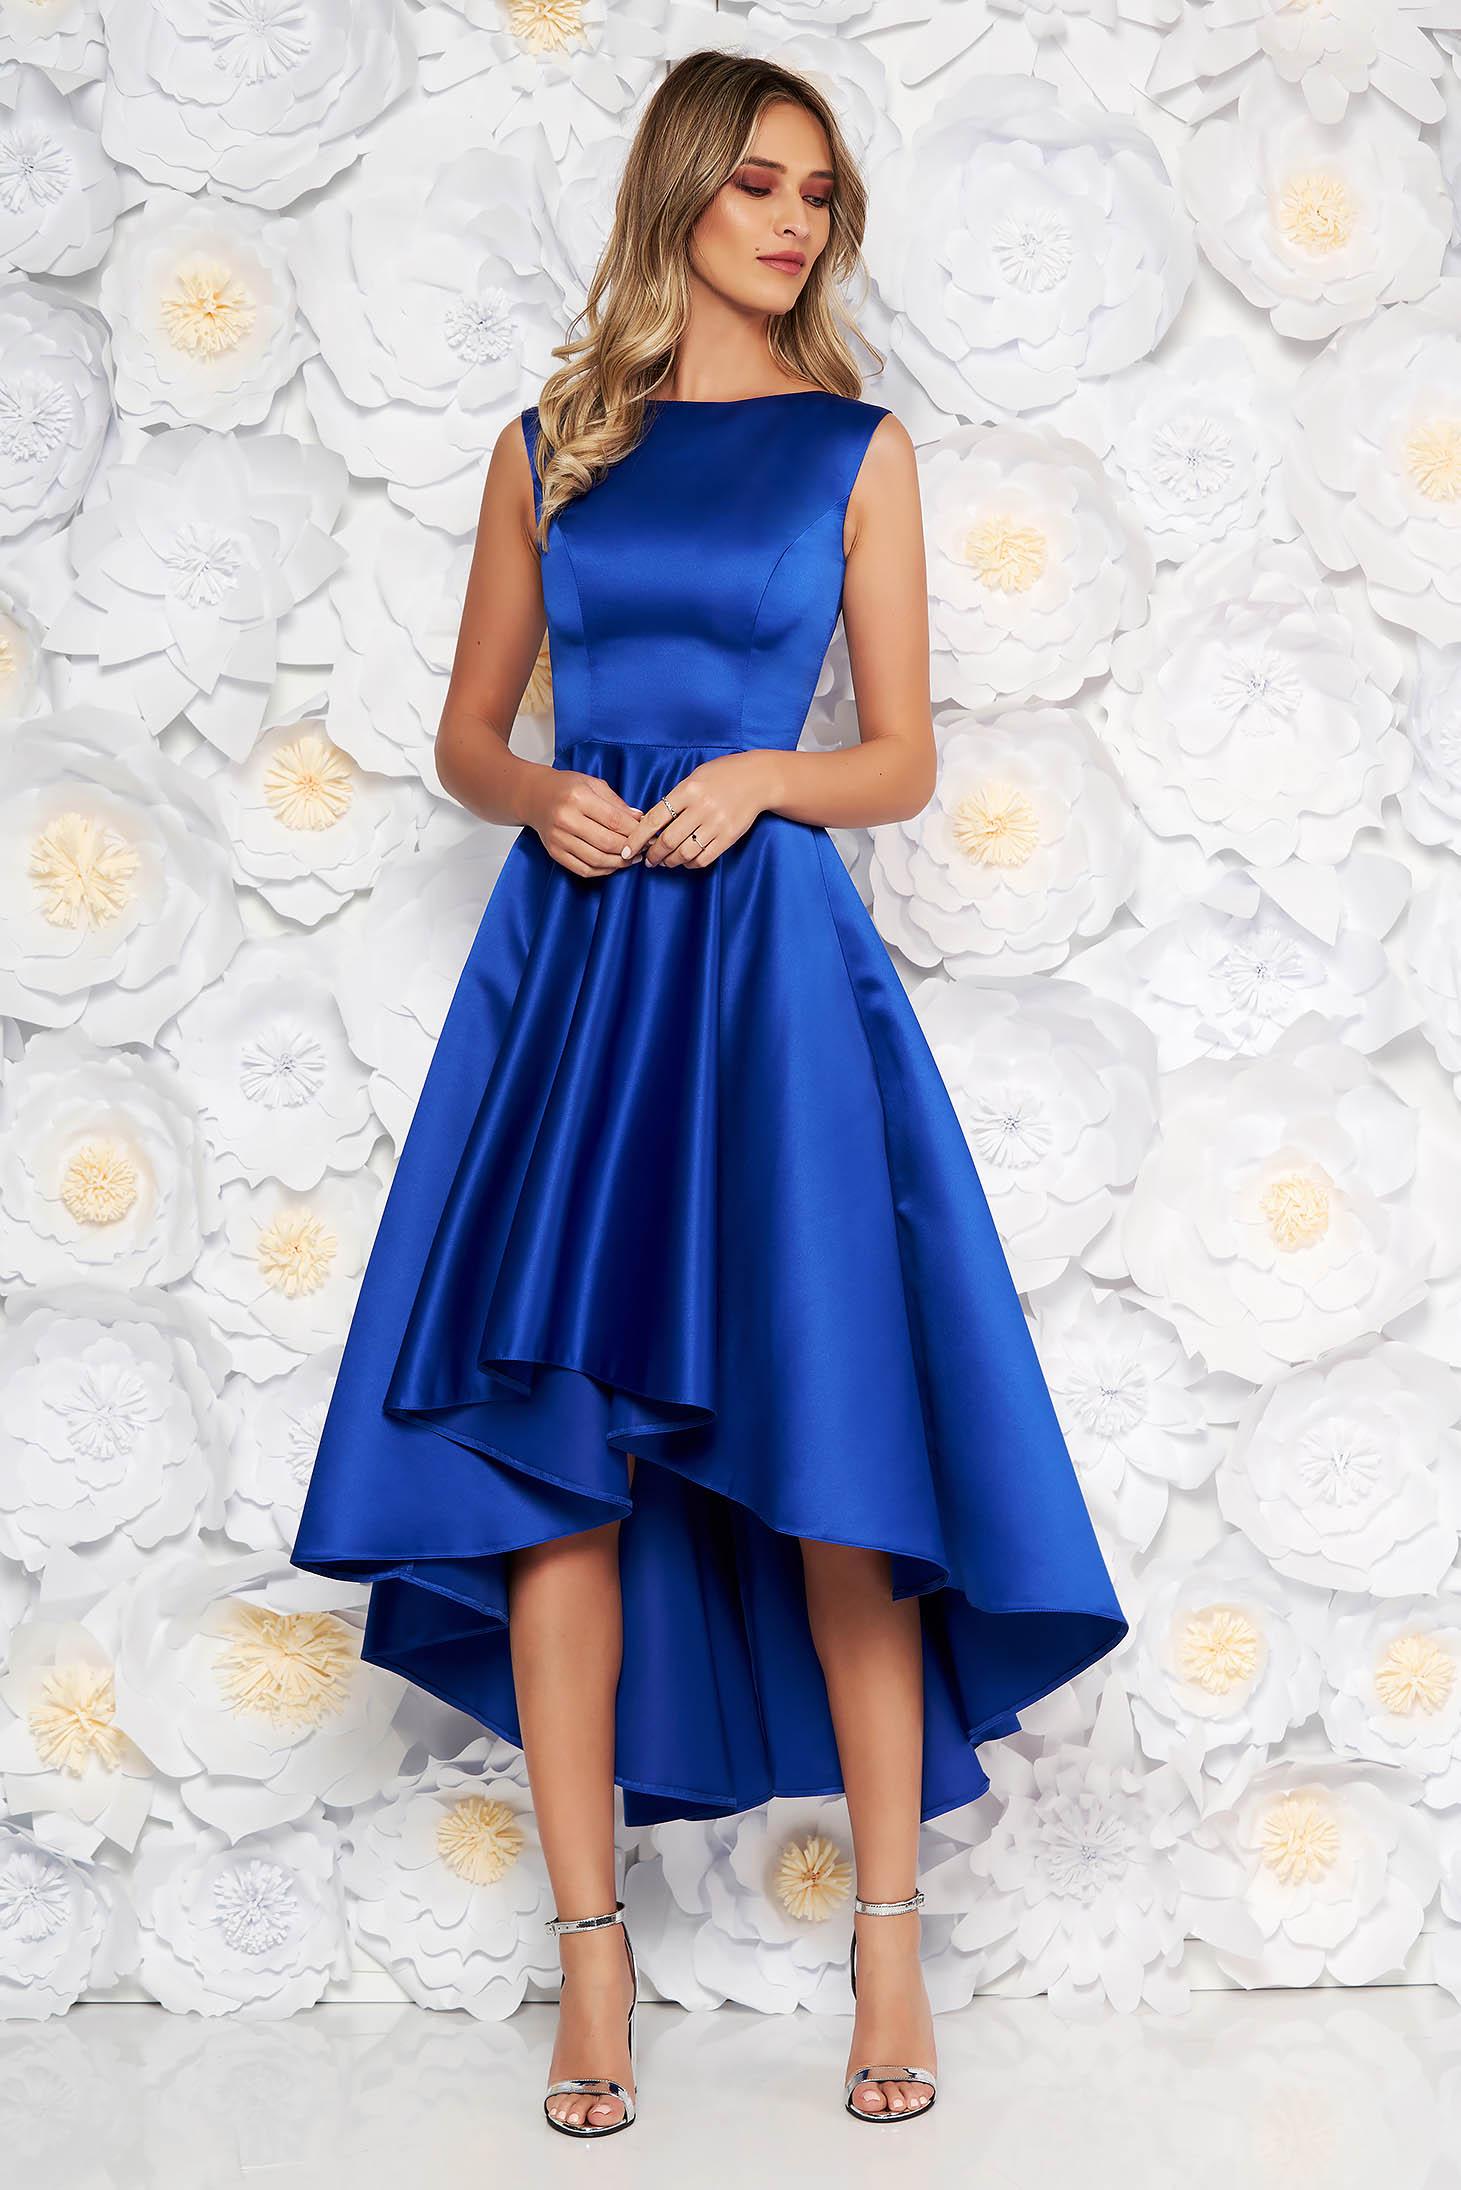 Blue occasional asymmetrical cloche dress from satin fabric texture sleeveless elegant